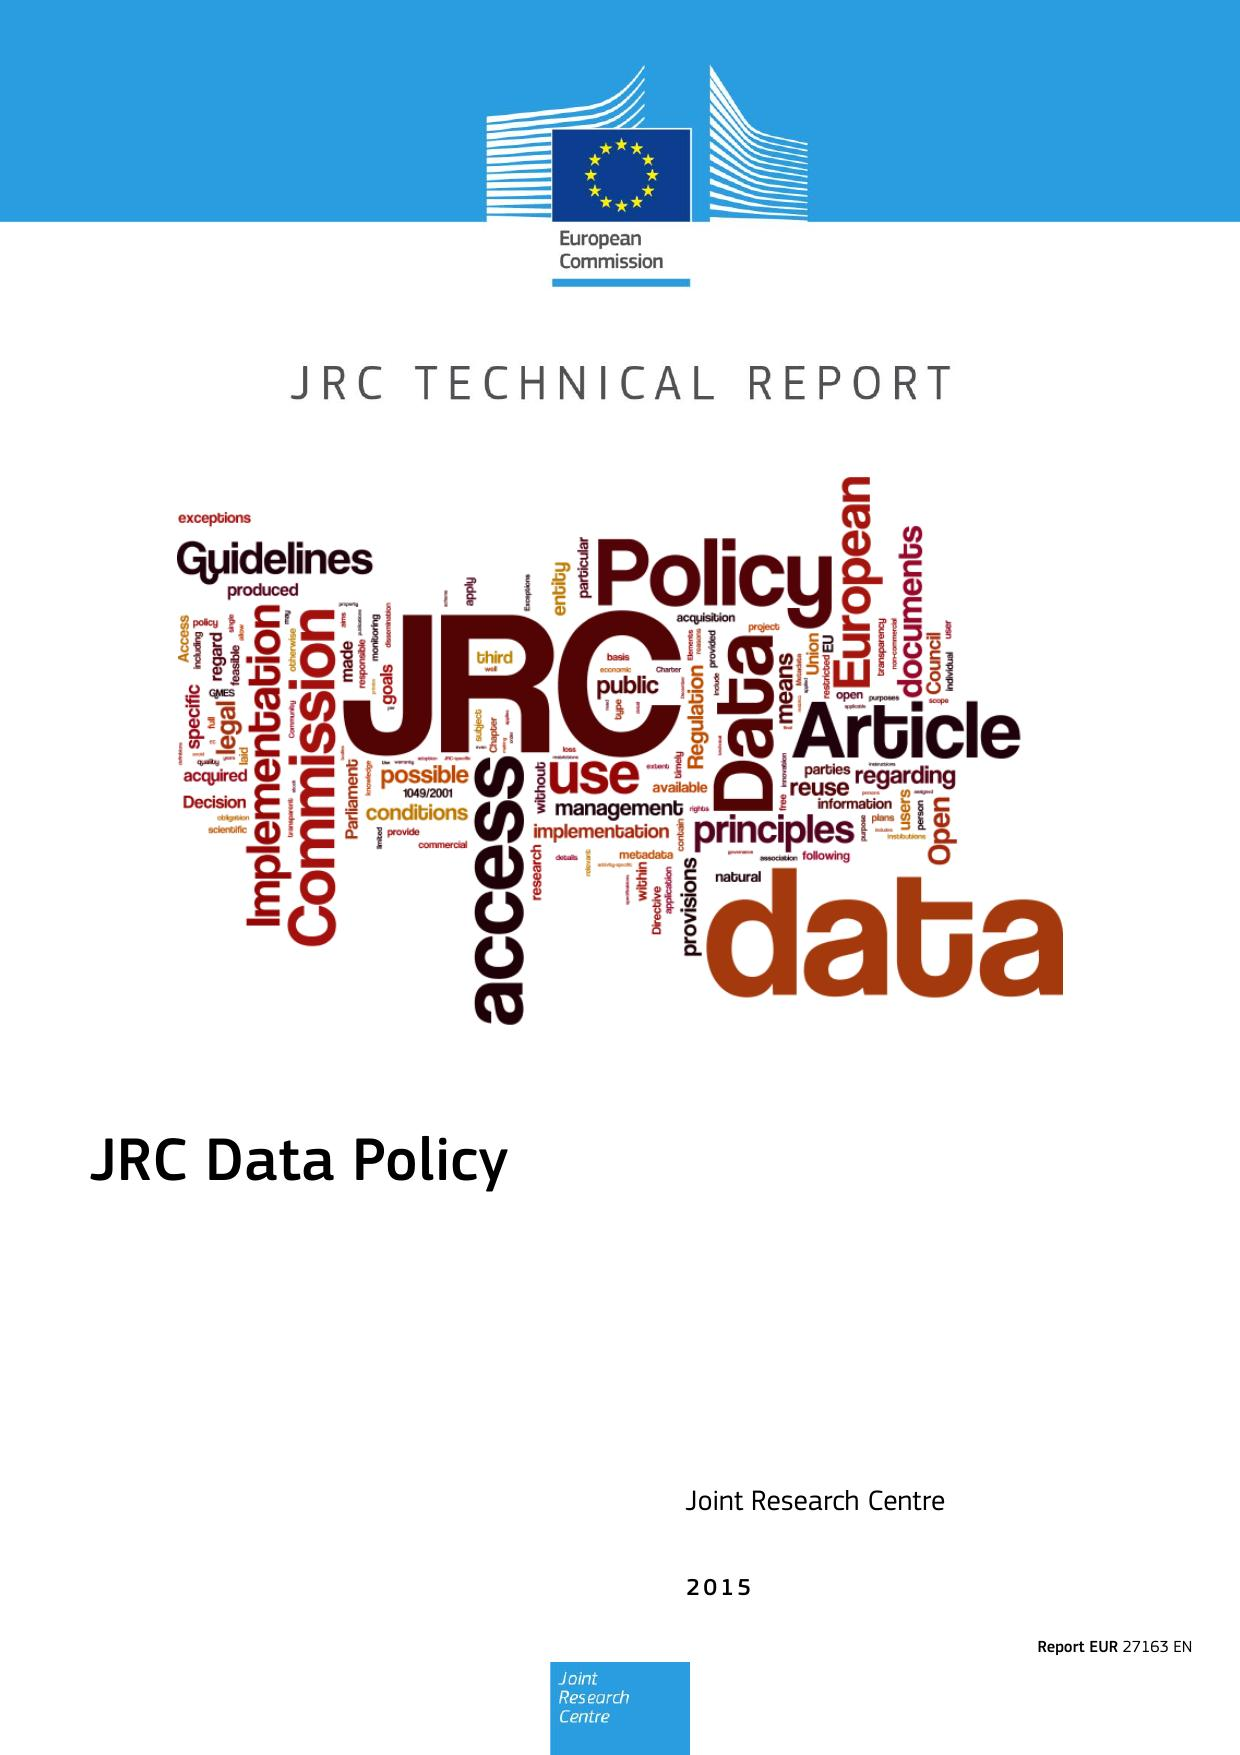 JRC Data Policy